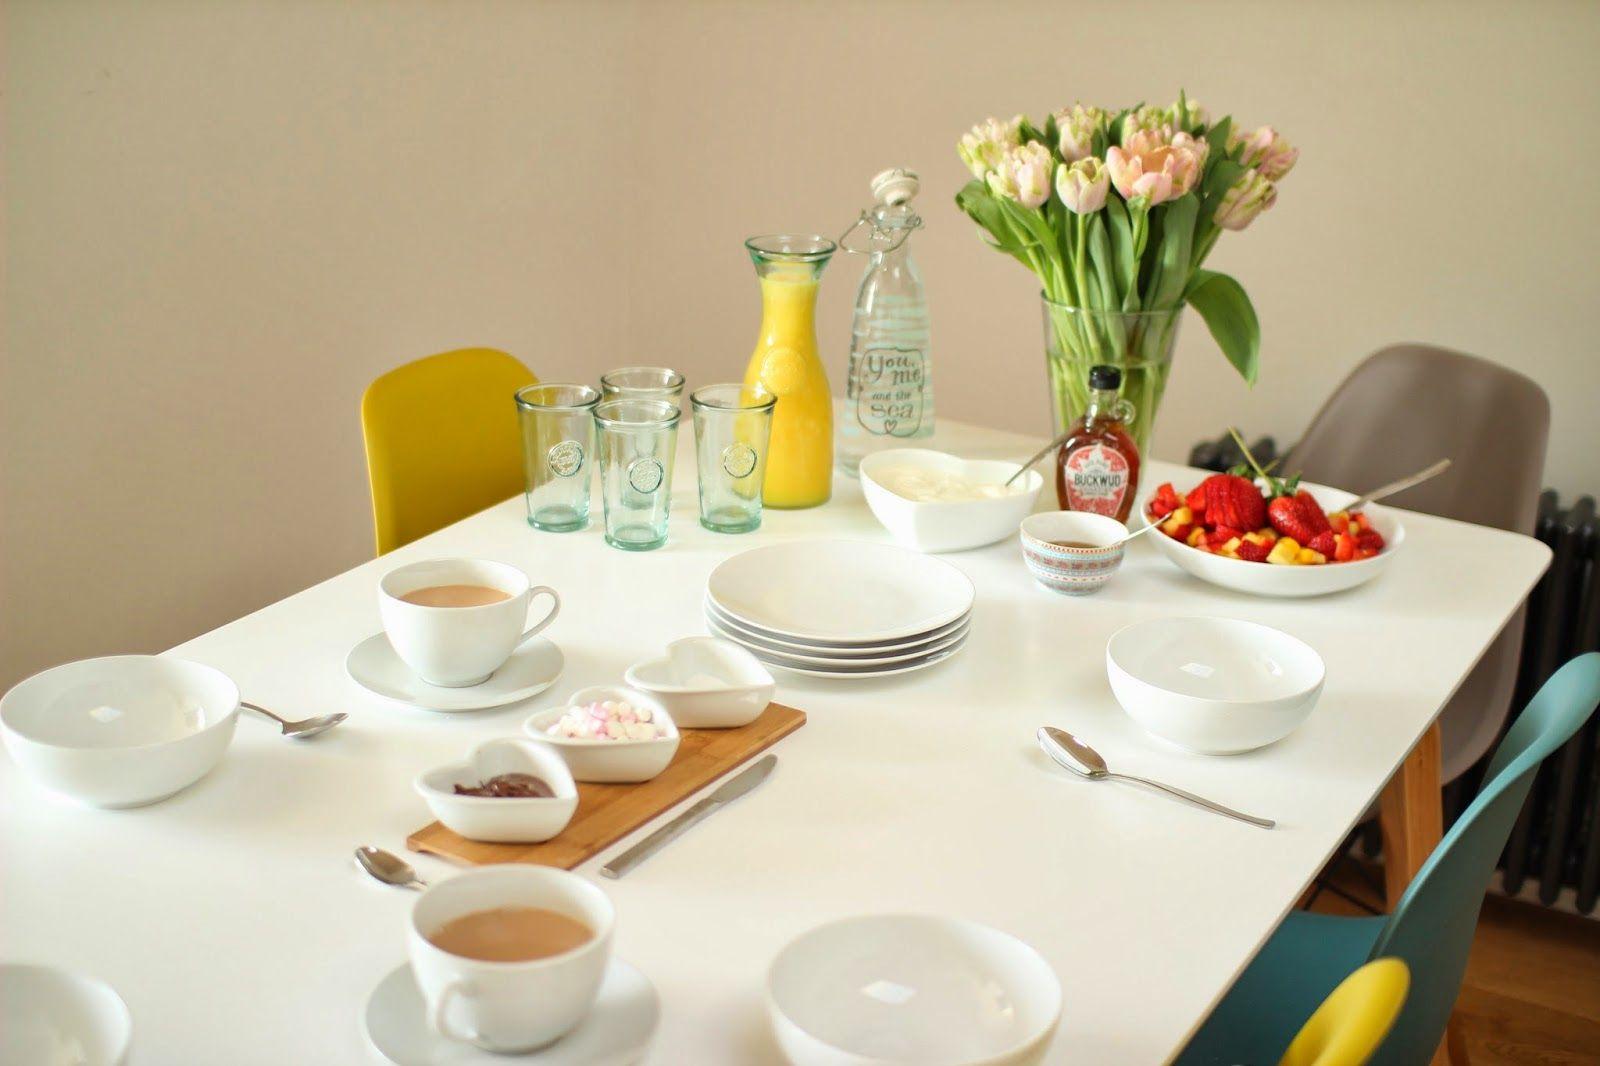 Pancake Breakfast Feast Zoella ApartmentPancake BreakfastBreakfast SetMorning